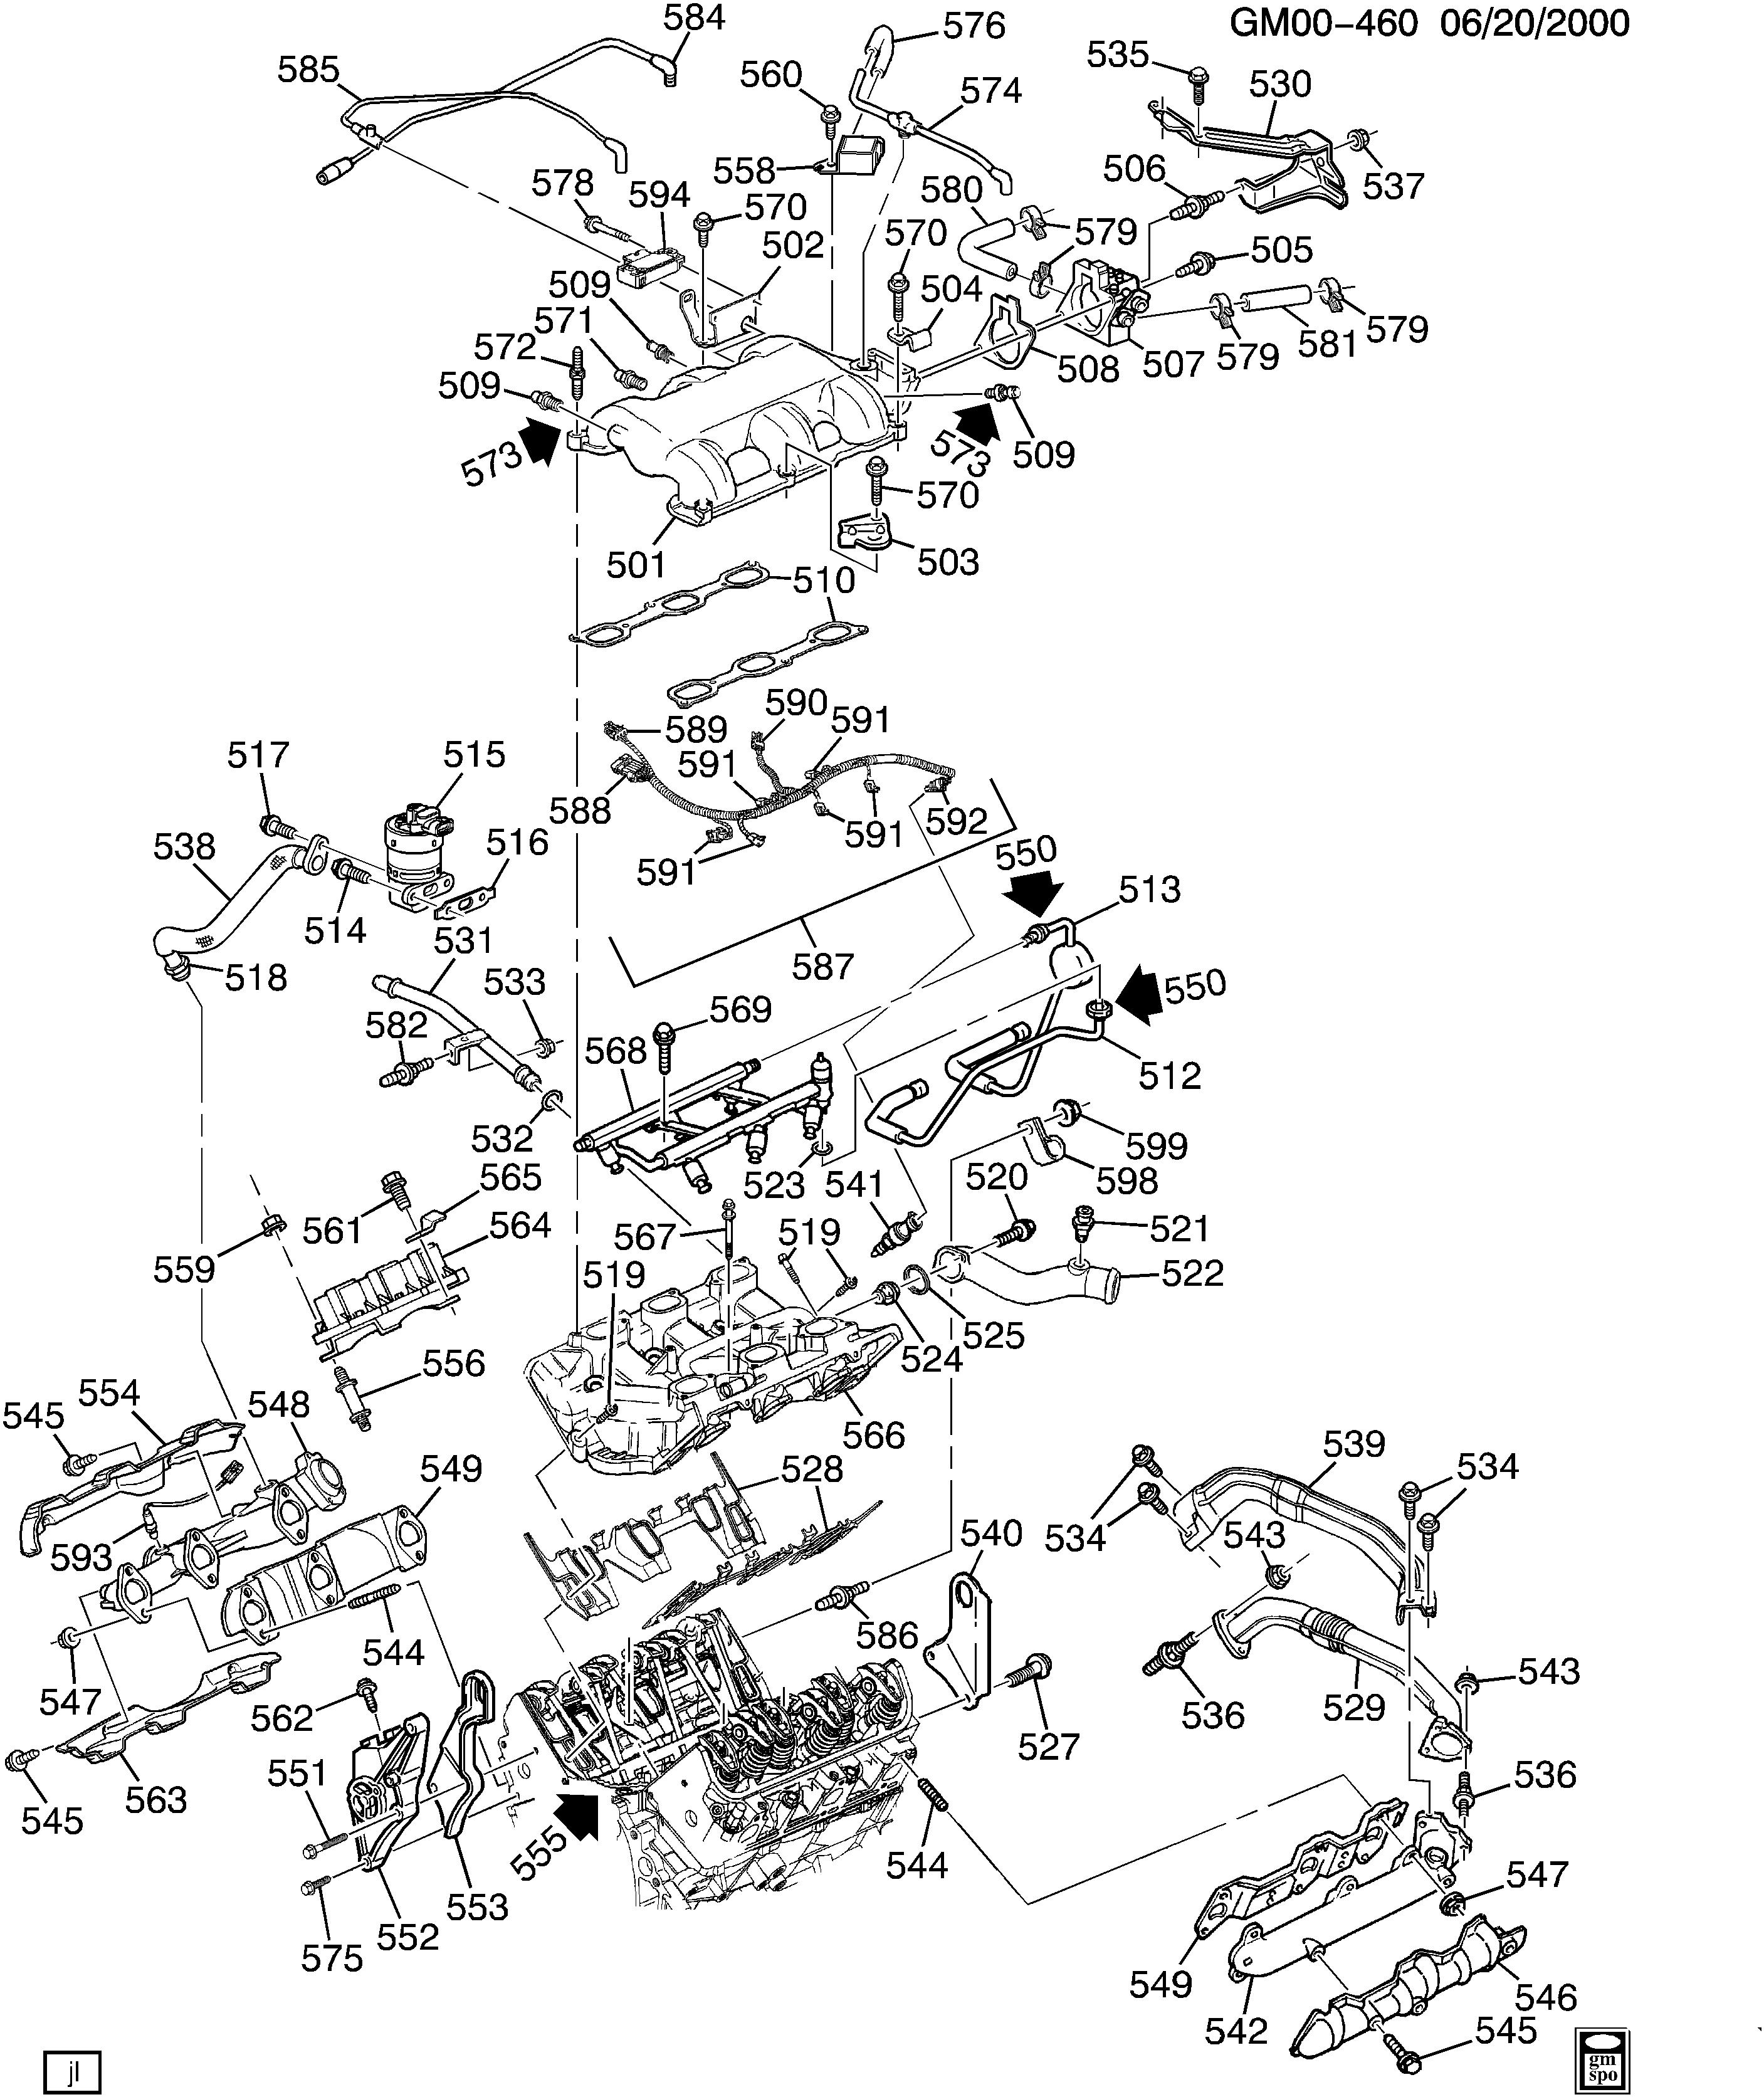 pontiac grand am n engine asm 3 4l v6 part 5 manifolds fuel Mustang II Mach 1 n engine asm 3 4l v6 part 5 manifolds fuel related parts